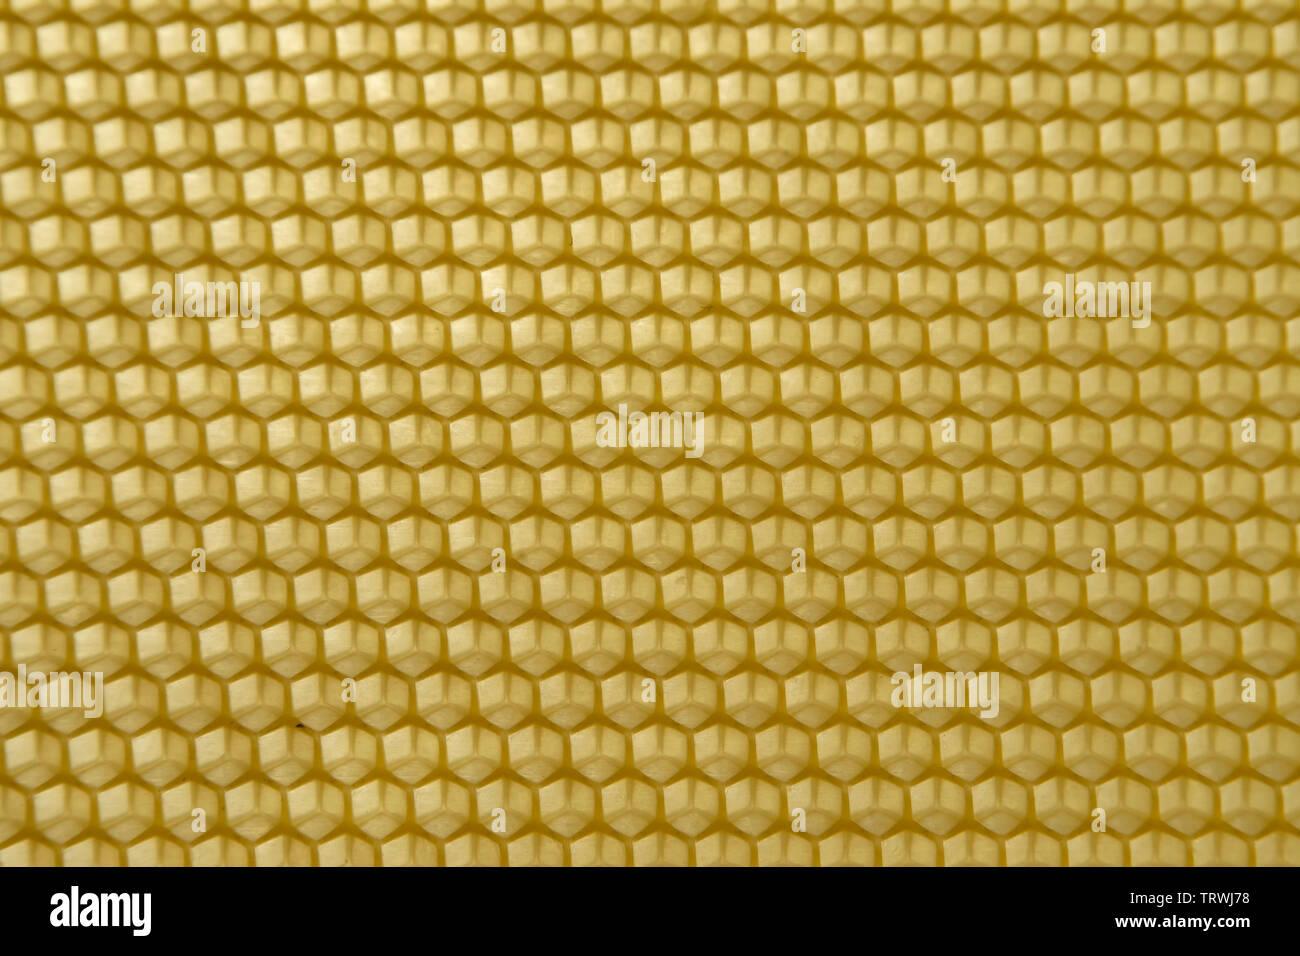 Panal de celdas hexagonales de cera Foto de stock